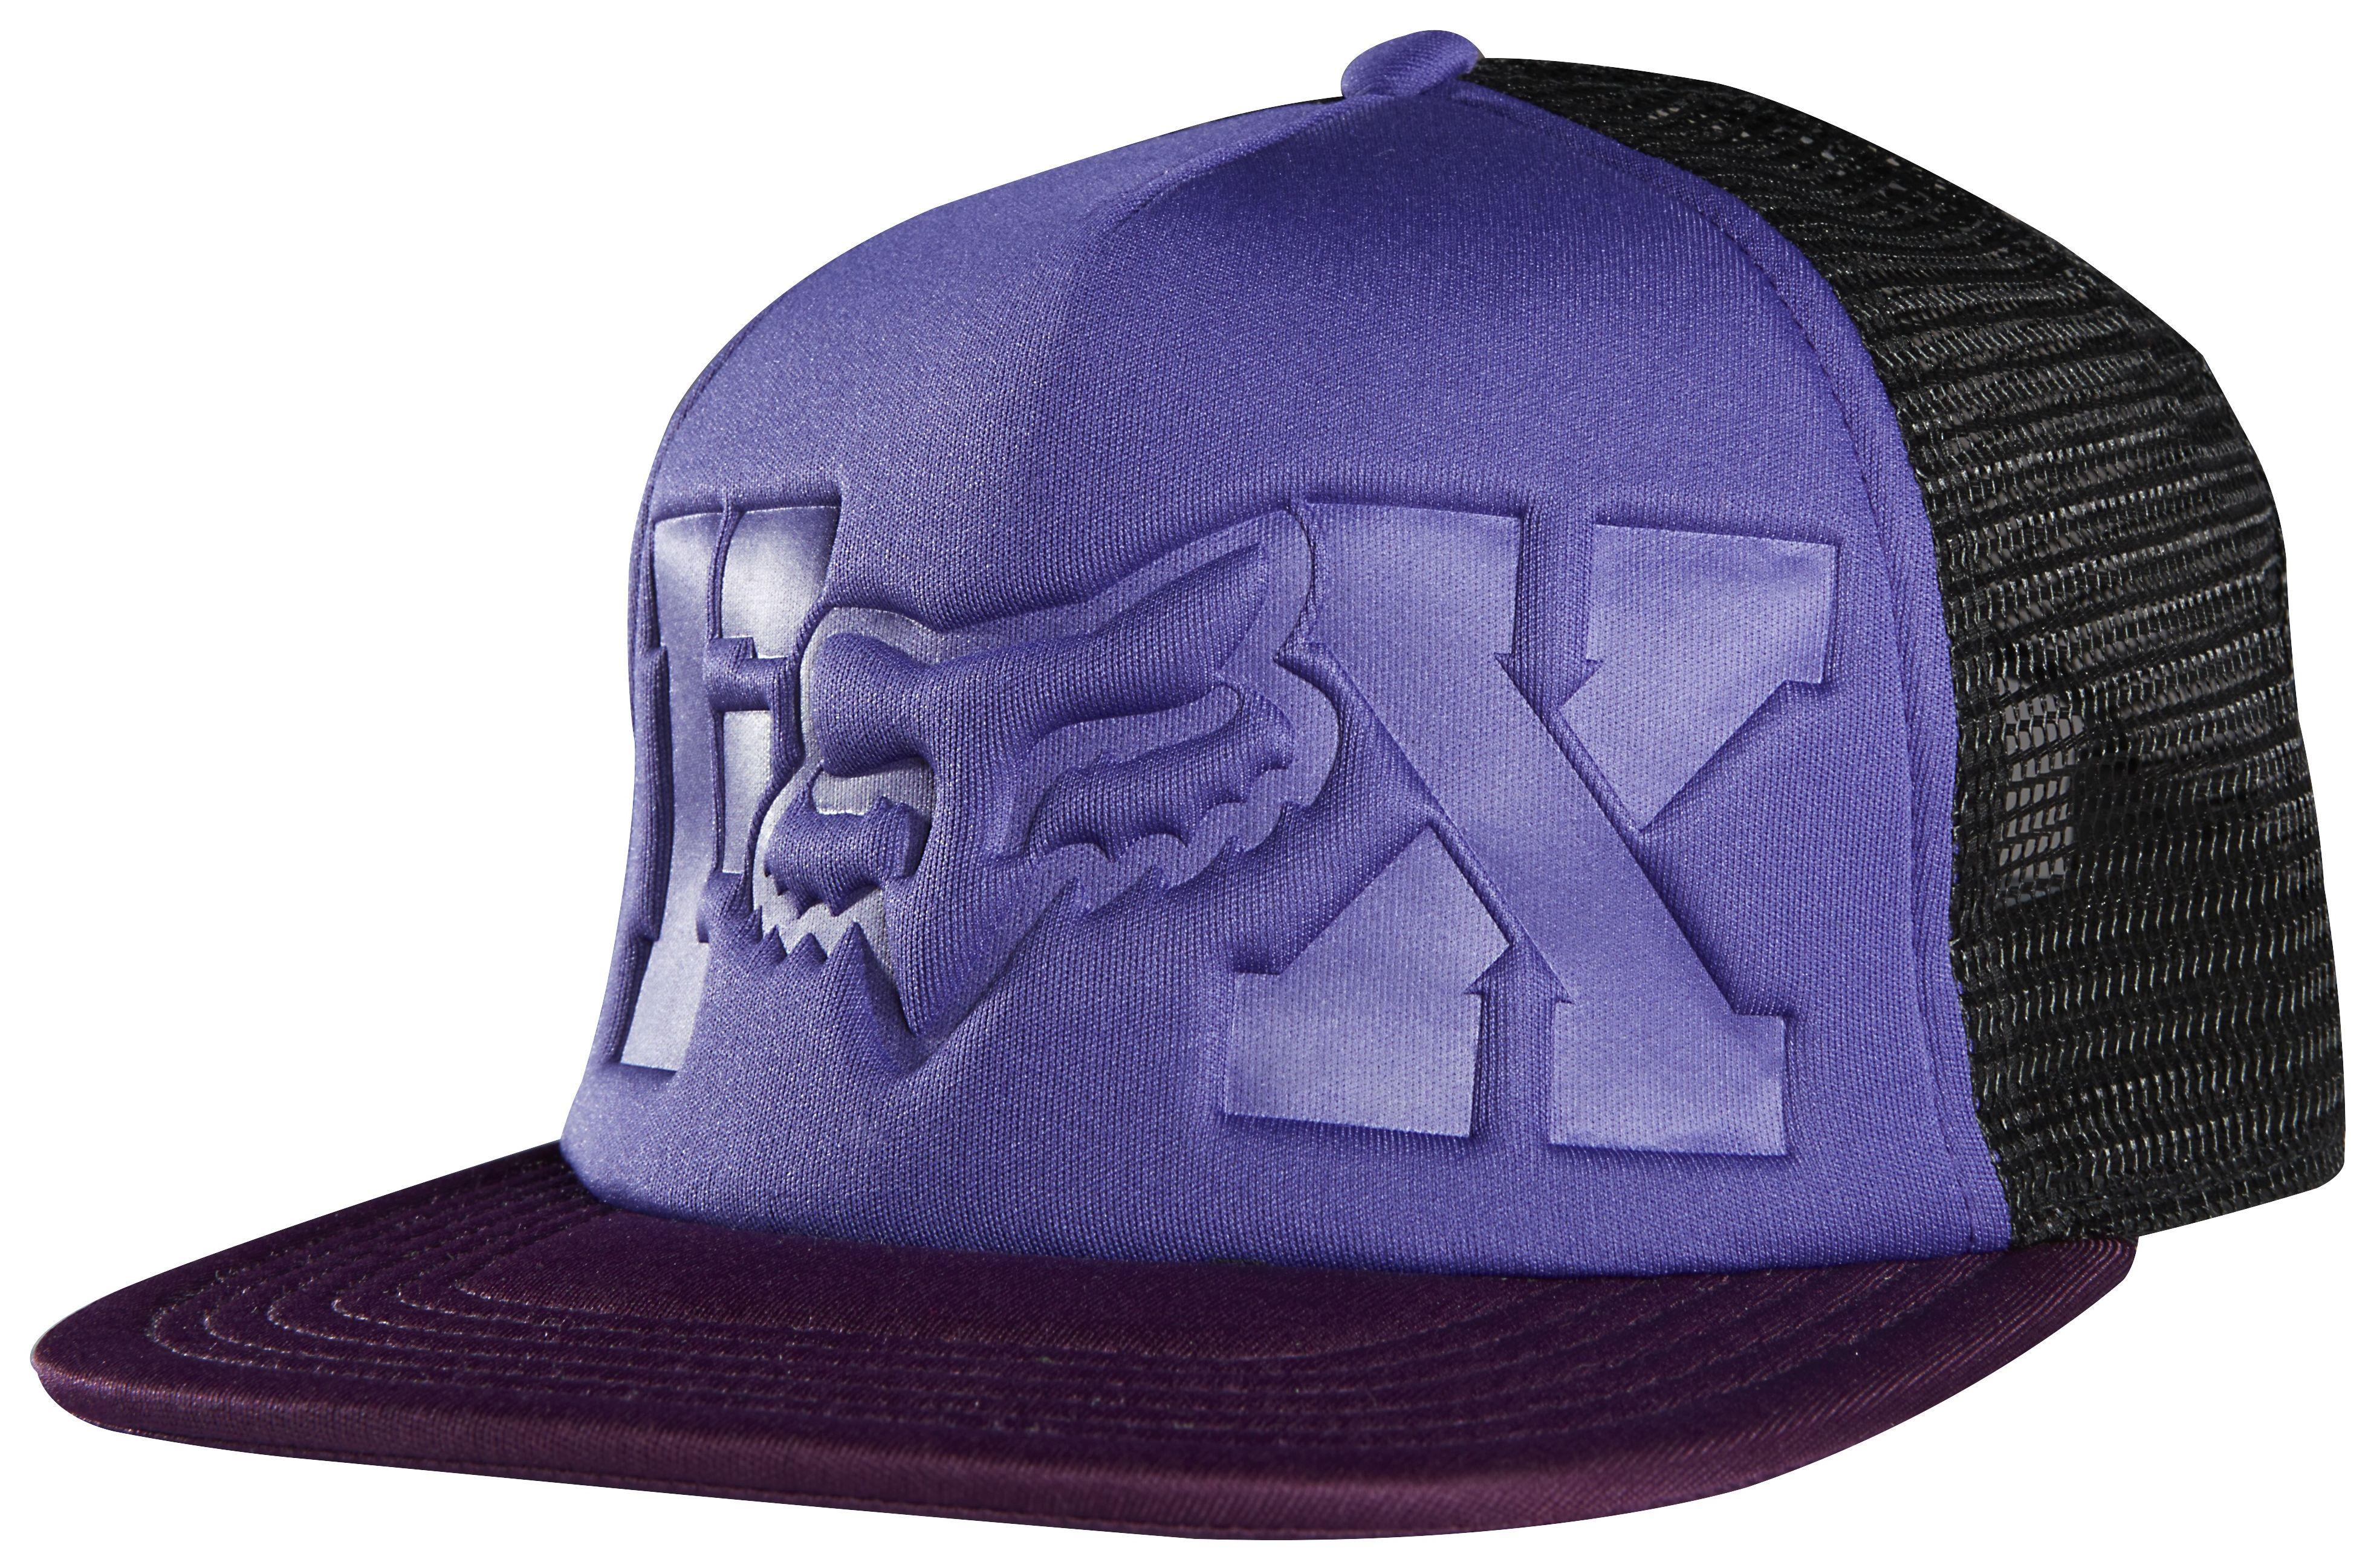 spain purple fox racing hat 92624 14772 58cdc342745c